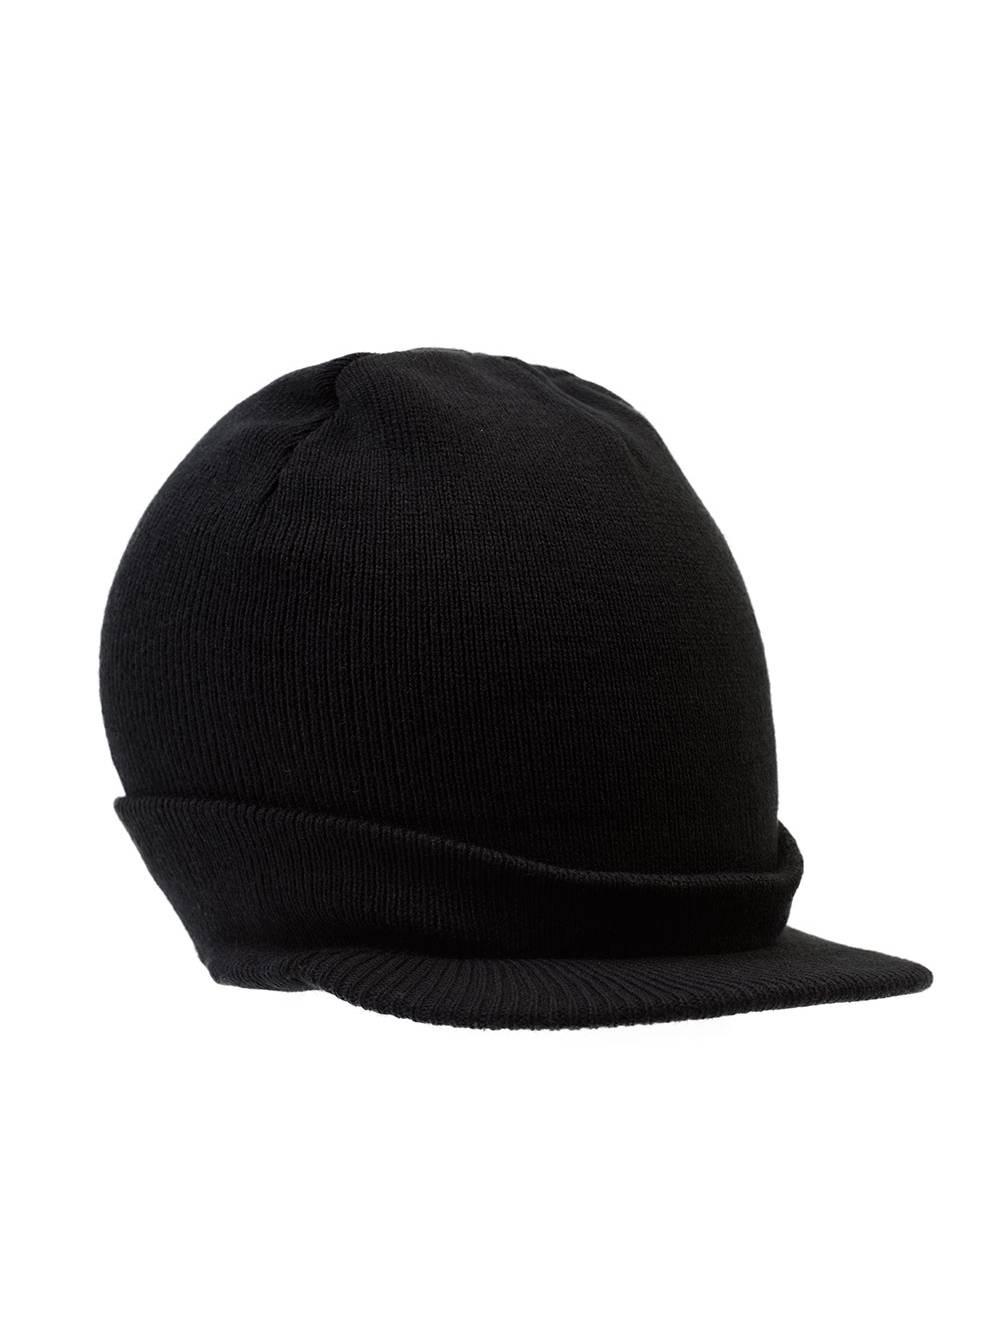 Beanie Hat with Bill Knit Cap - Black 653d36a213f